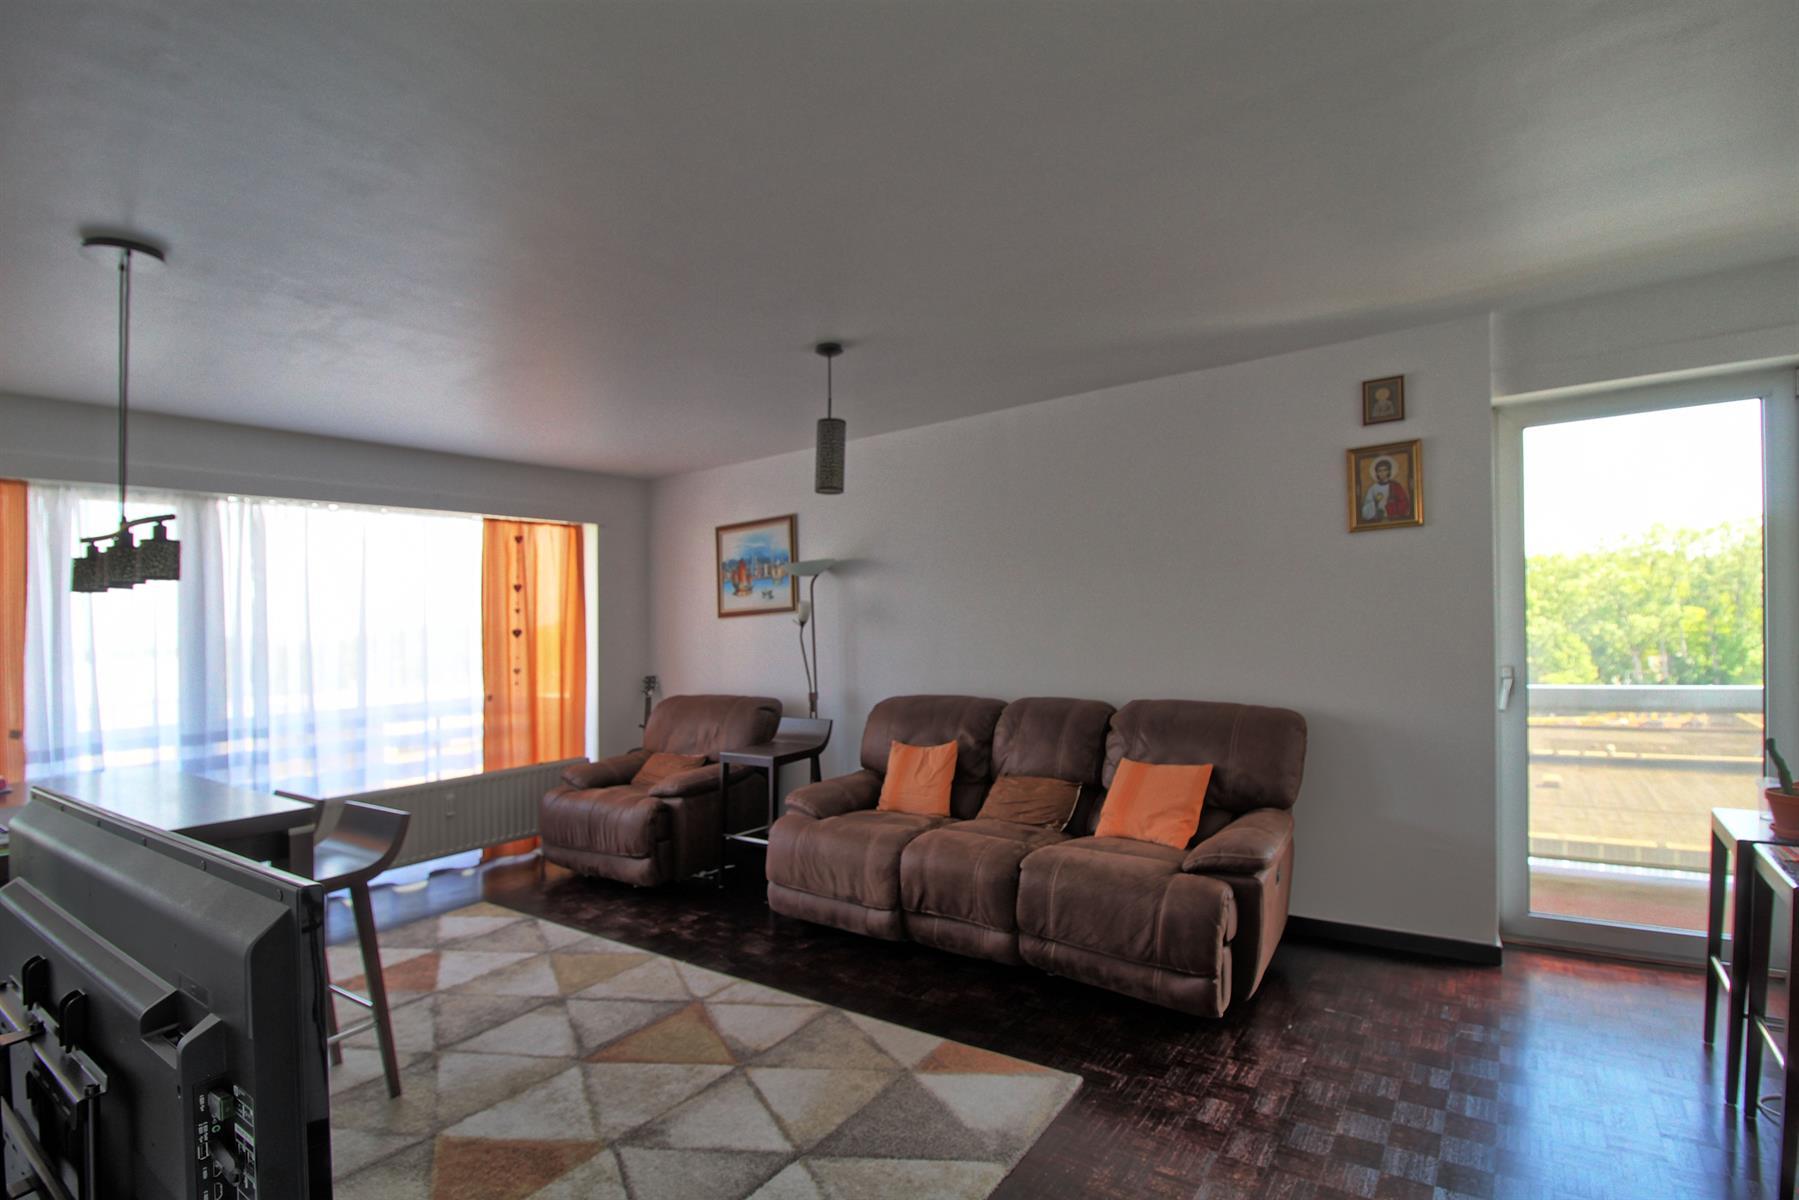 Appartement - Woluwe-Saint-Lambert - #4207409-1